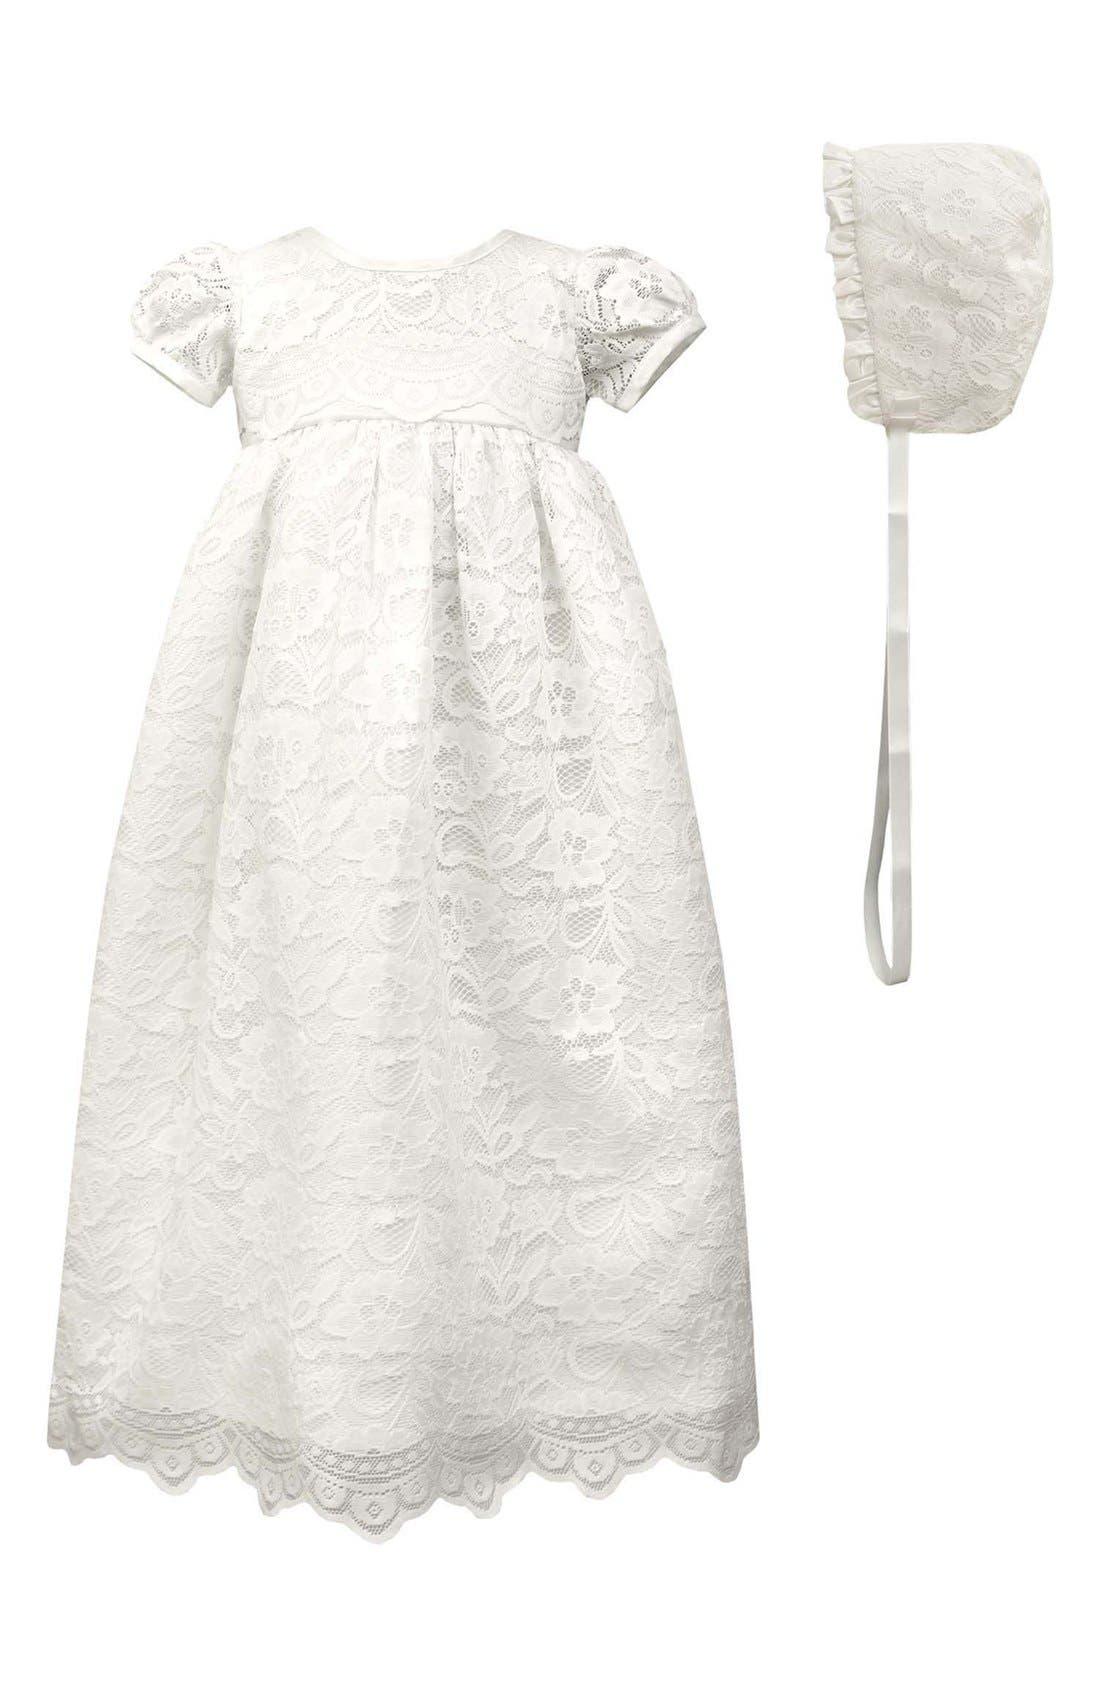 White Lace Christening Dress